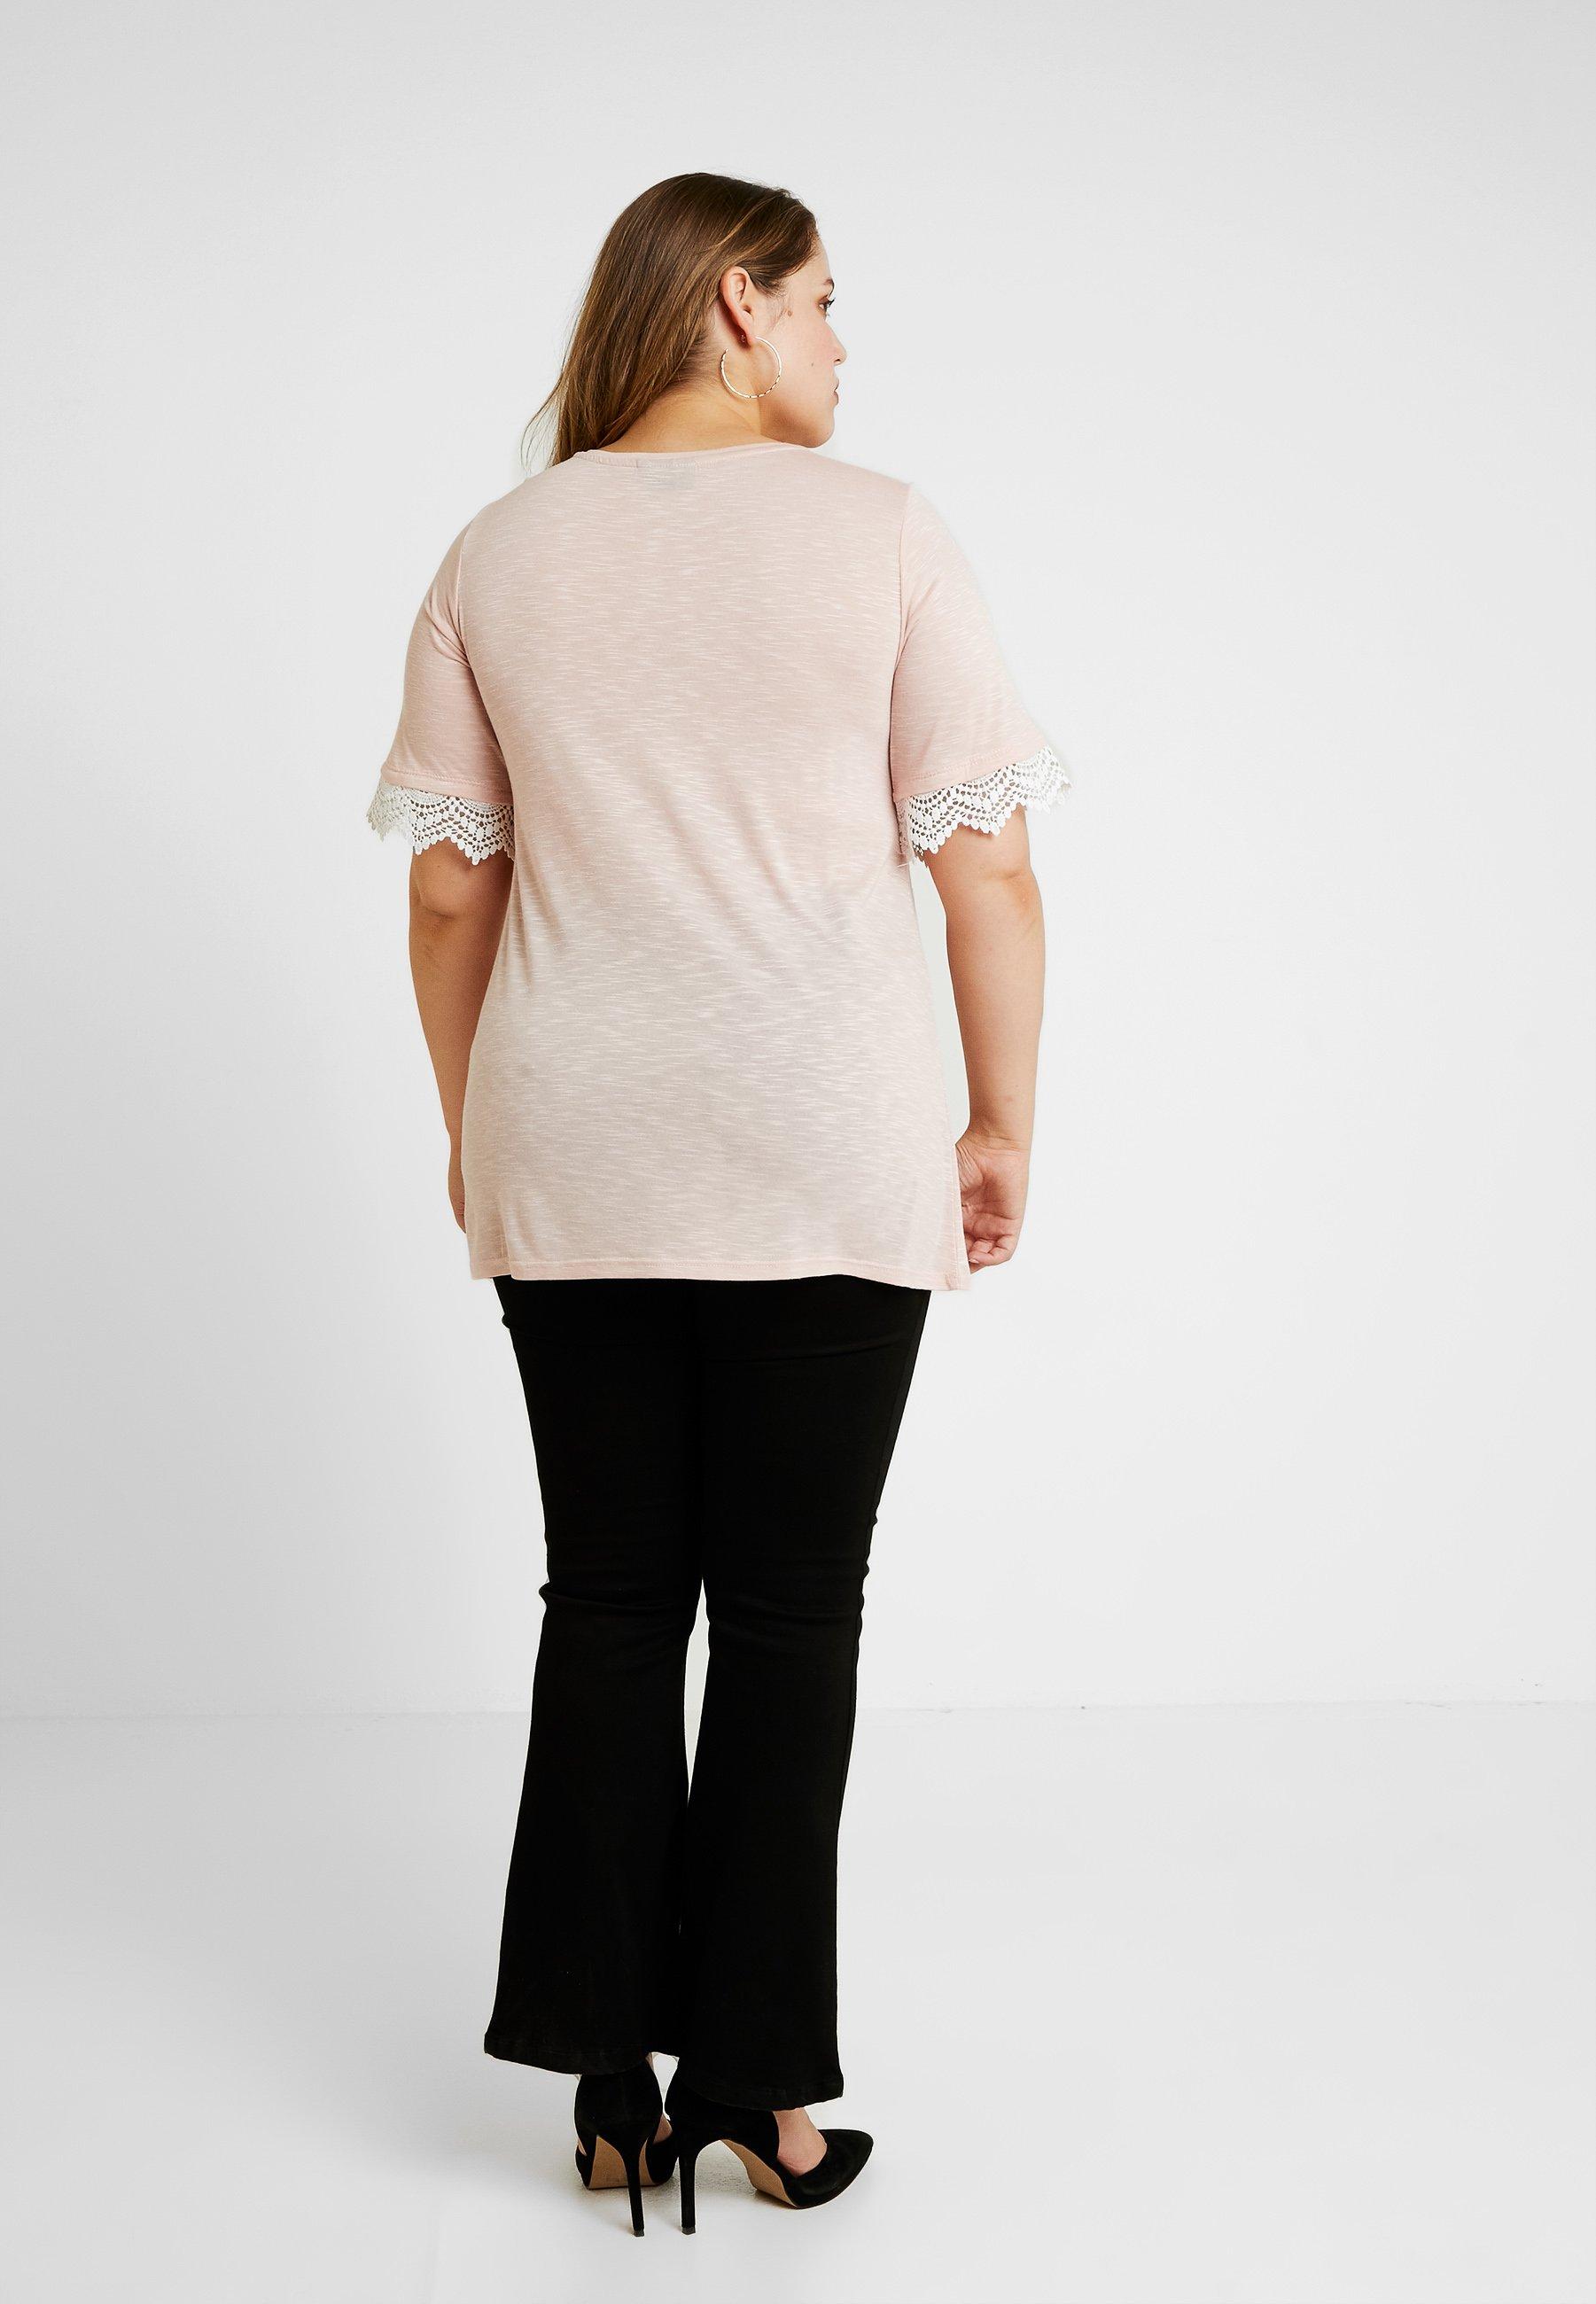 Smoke Zizzi XameliaT Rose shirt Imprimé white 3j45ARL